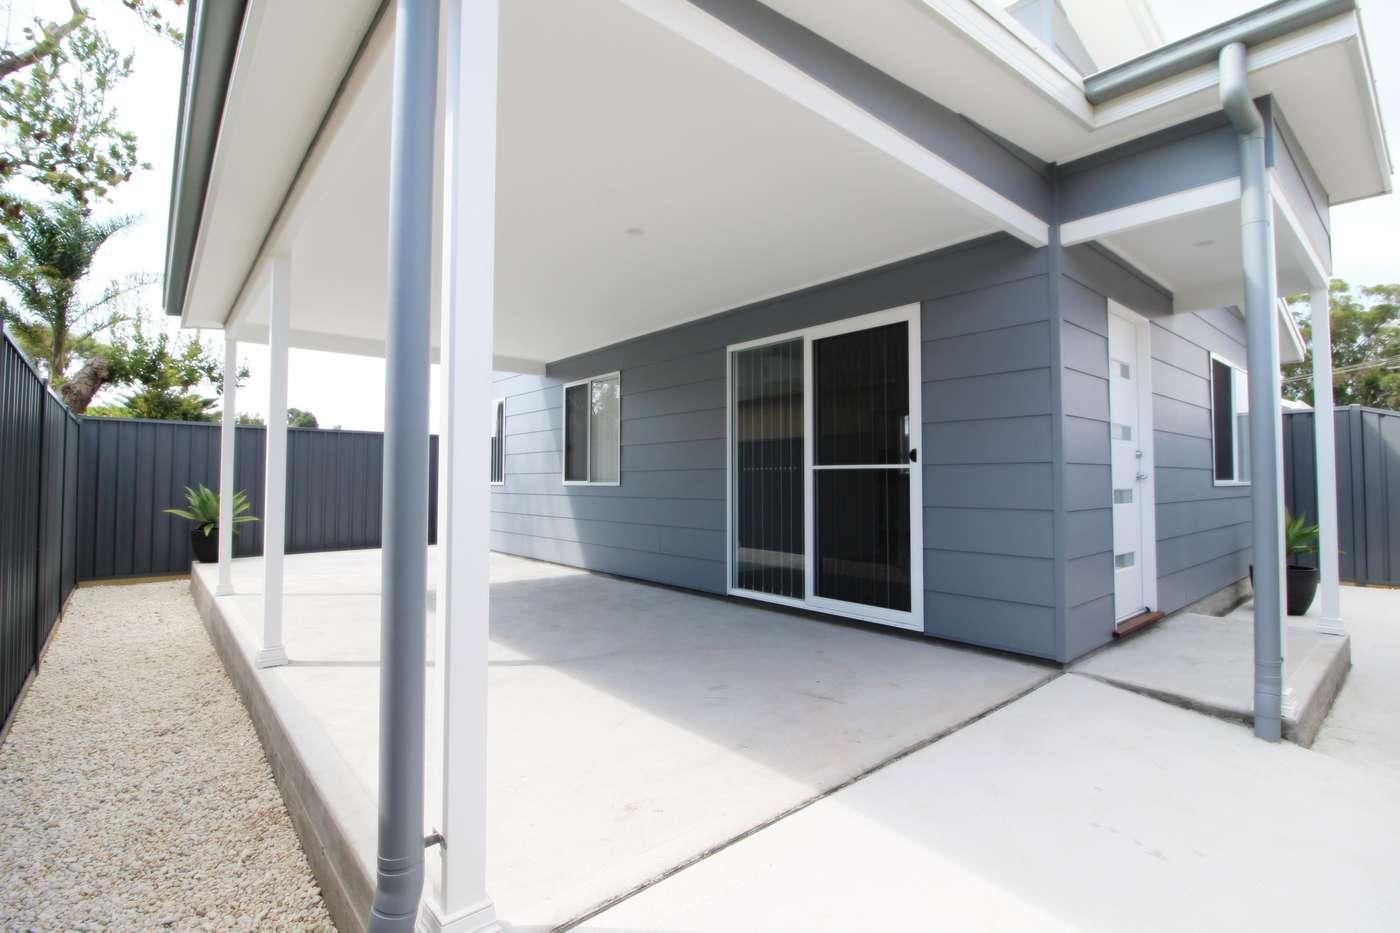 Main view of Homely house listing, 115a Karingi Street, Umina Beach, NSW 2257